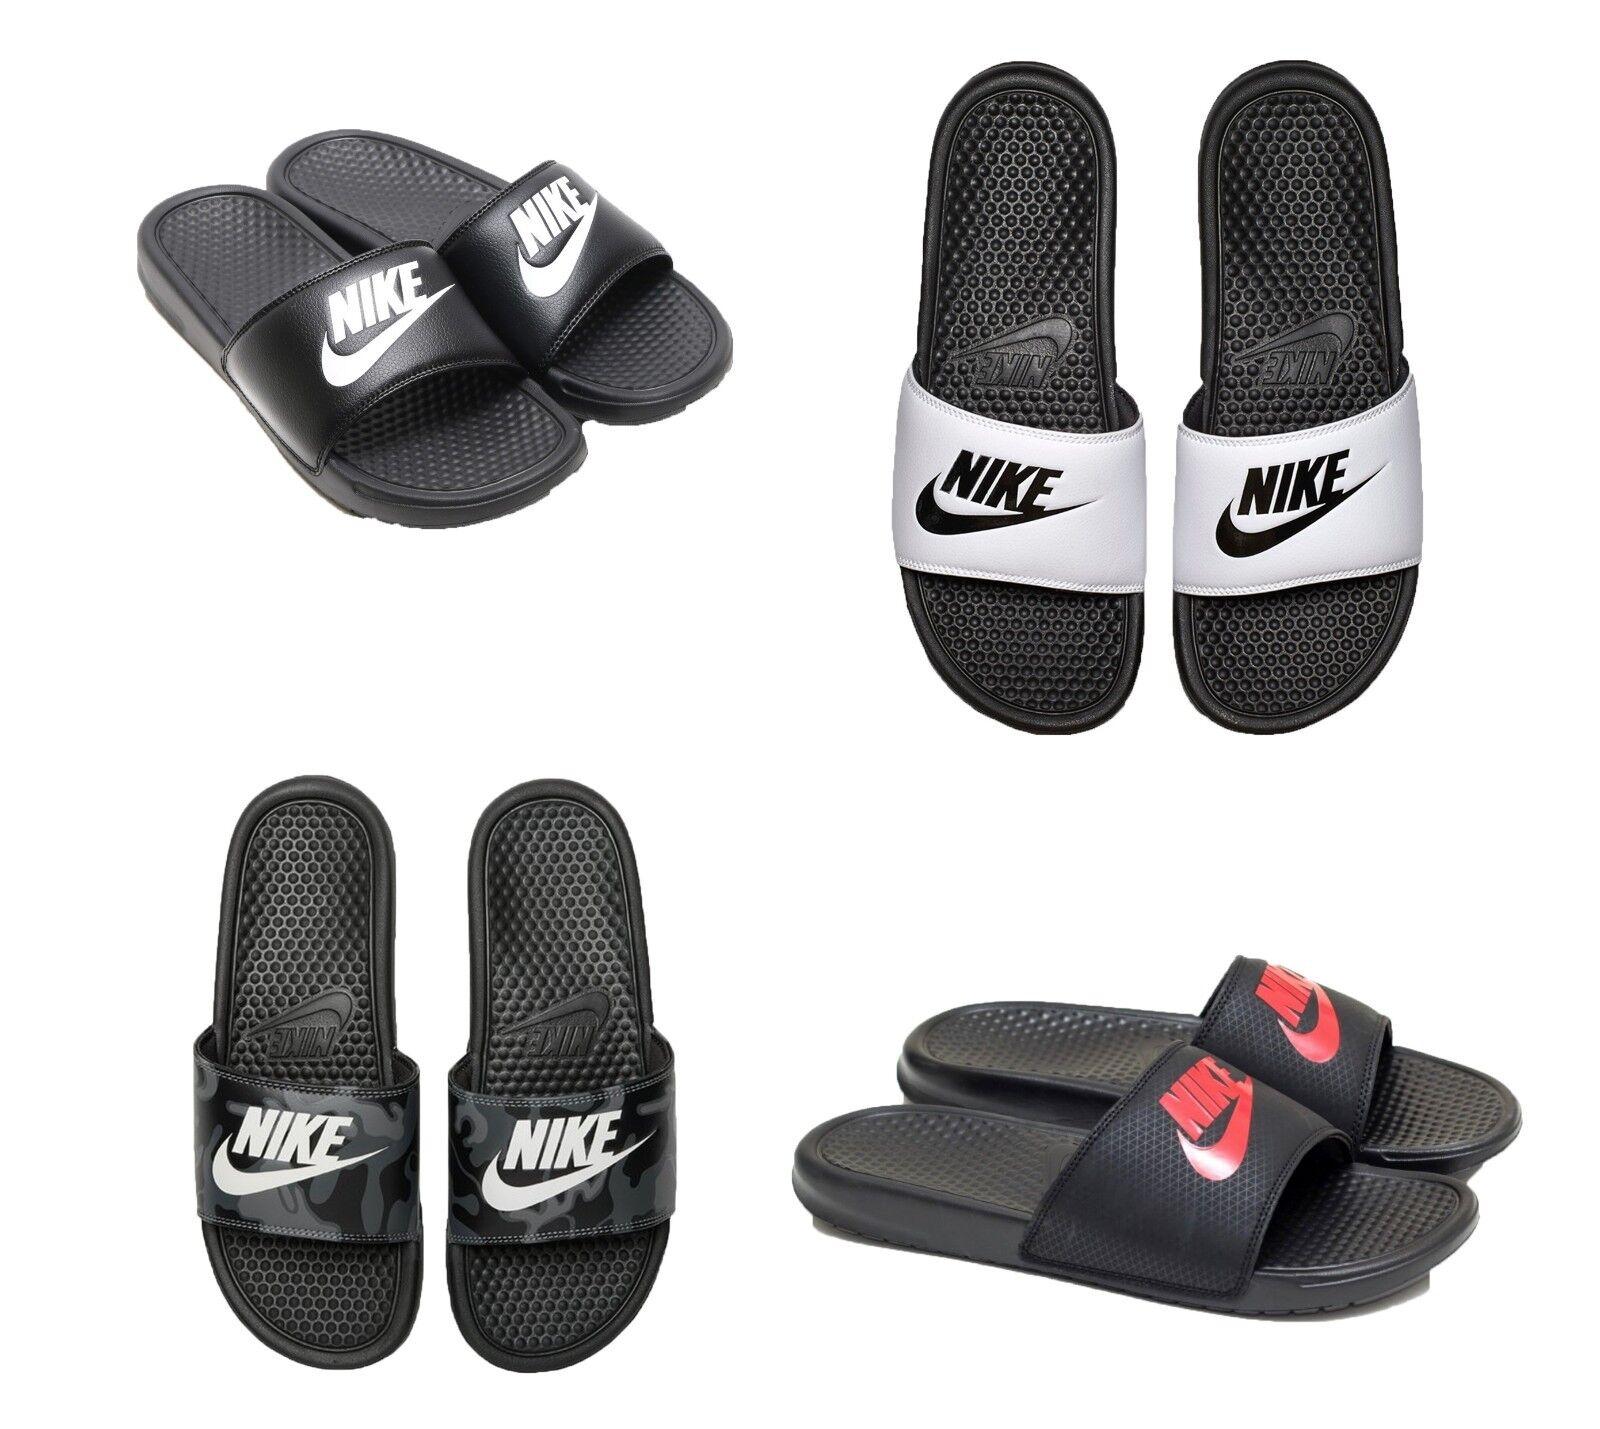 Nuovo 343880 Nike Benassi Jdi Infradito/Sandali 343880 Nuovo Bianco Nero 9 10 11 12 13 14 1a057e